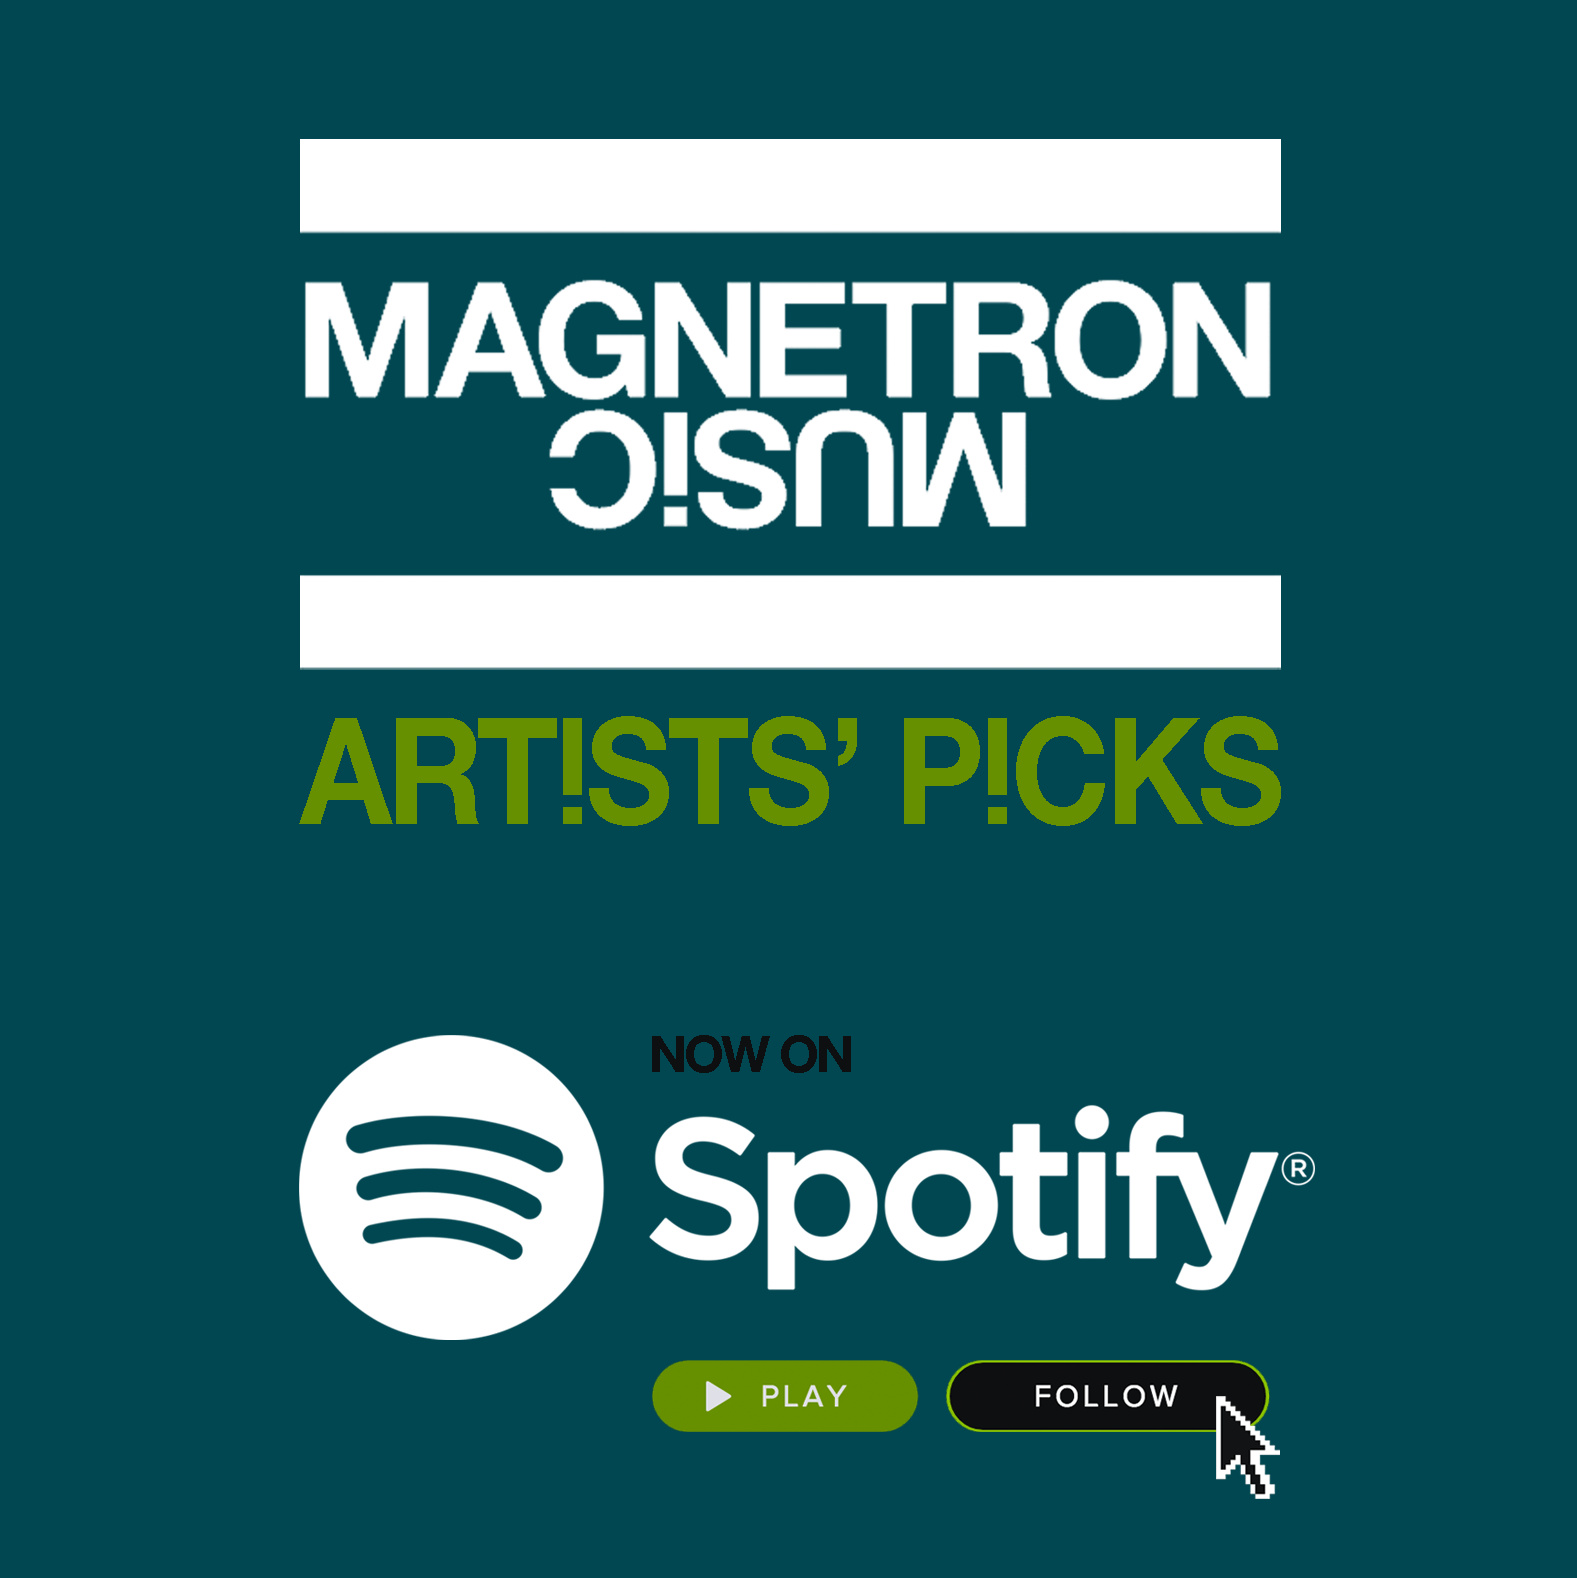 magnetron-spotify-promo-vierkant